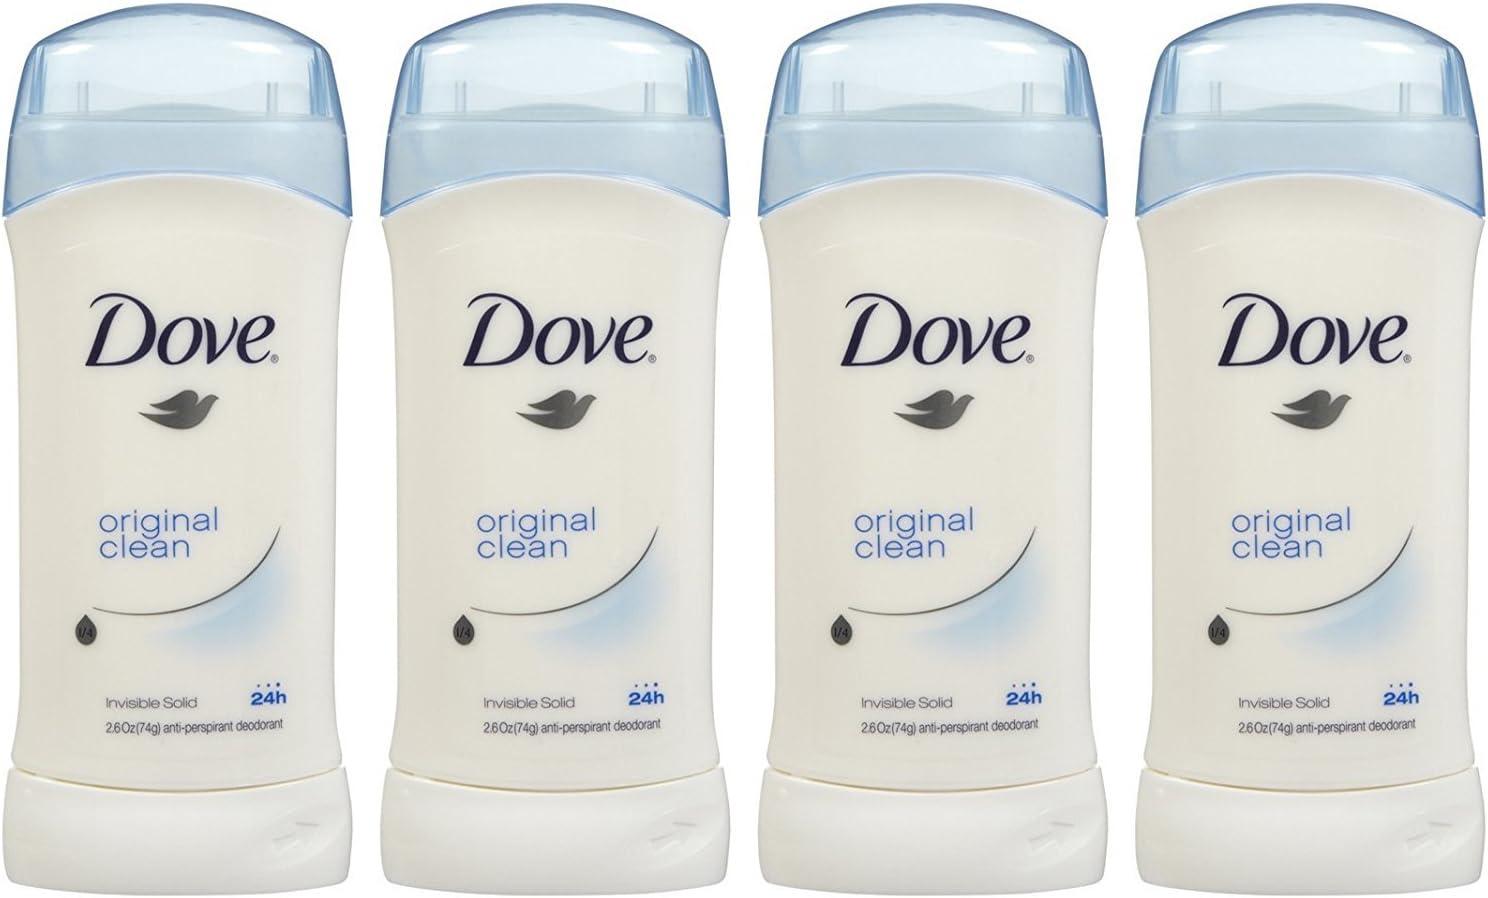 Dove Invisible Solid Deodorant, Original Clean - 2.6 oz - 4 pk